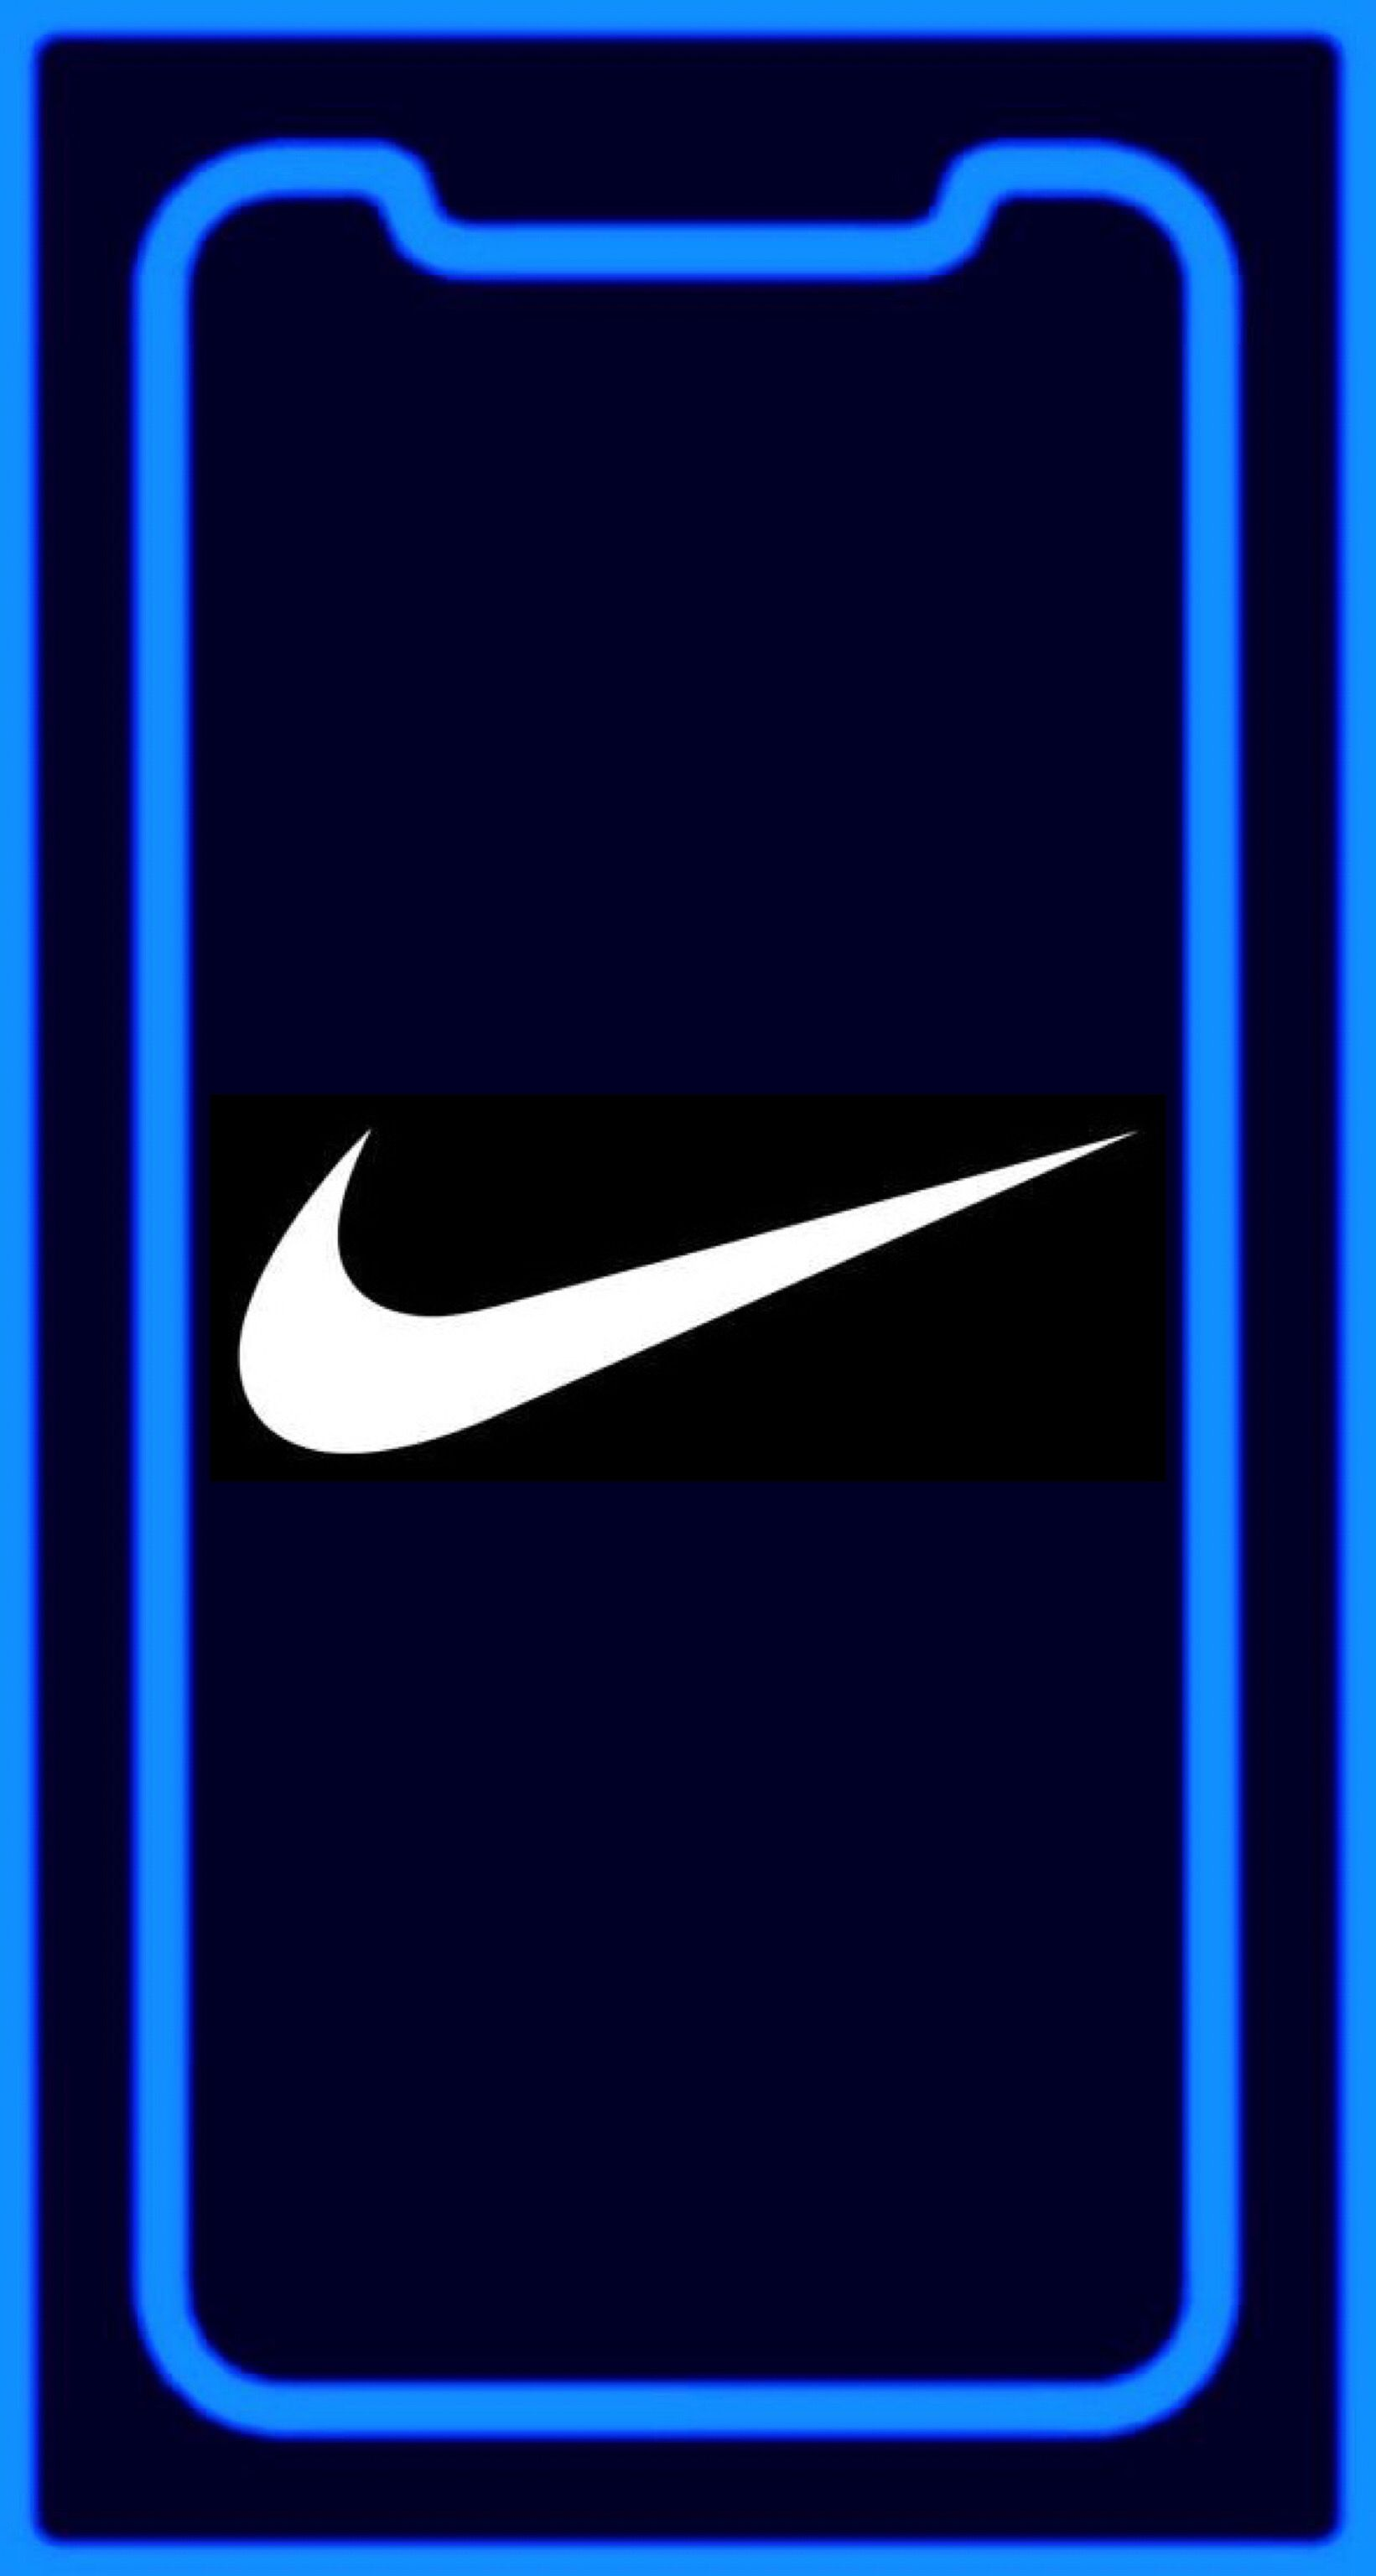 Wallpaper Iphone X Nike White Nike Screensavers Screensaver Iphone Best Iphone Wallpapers